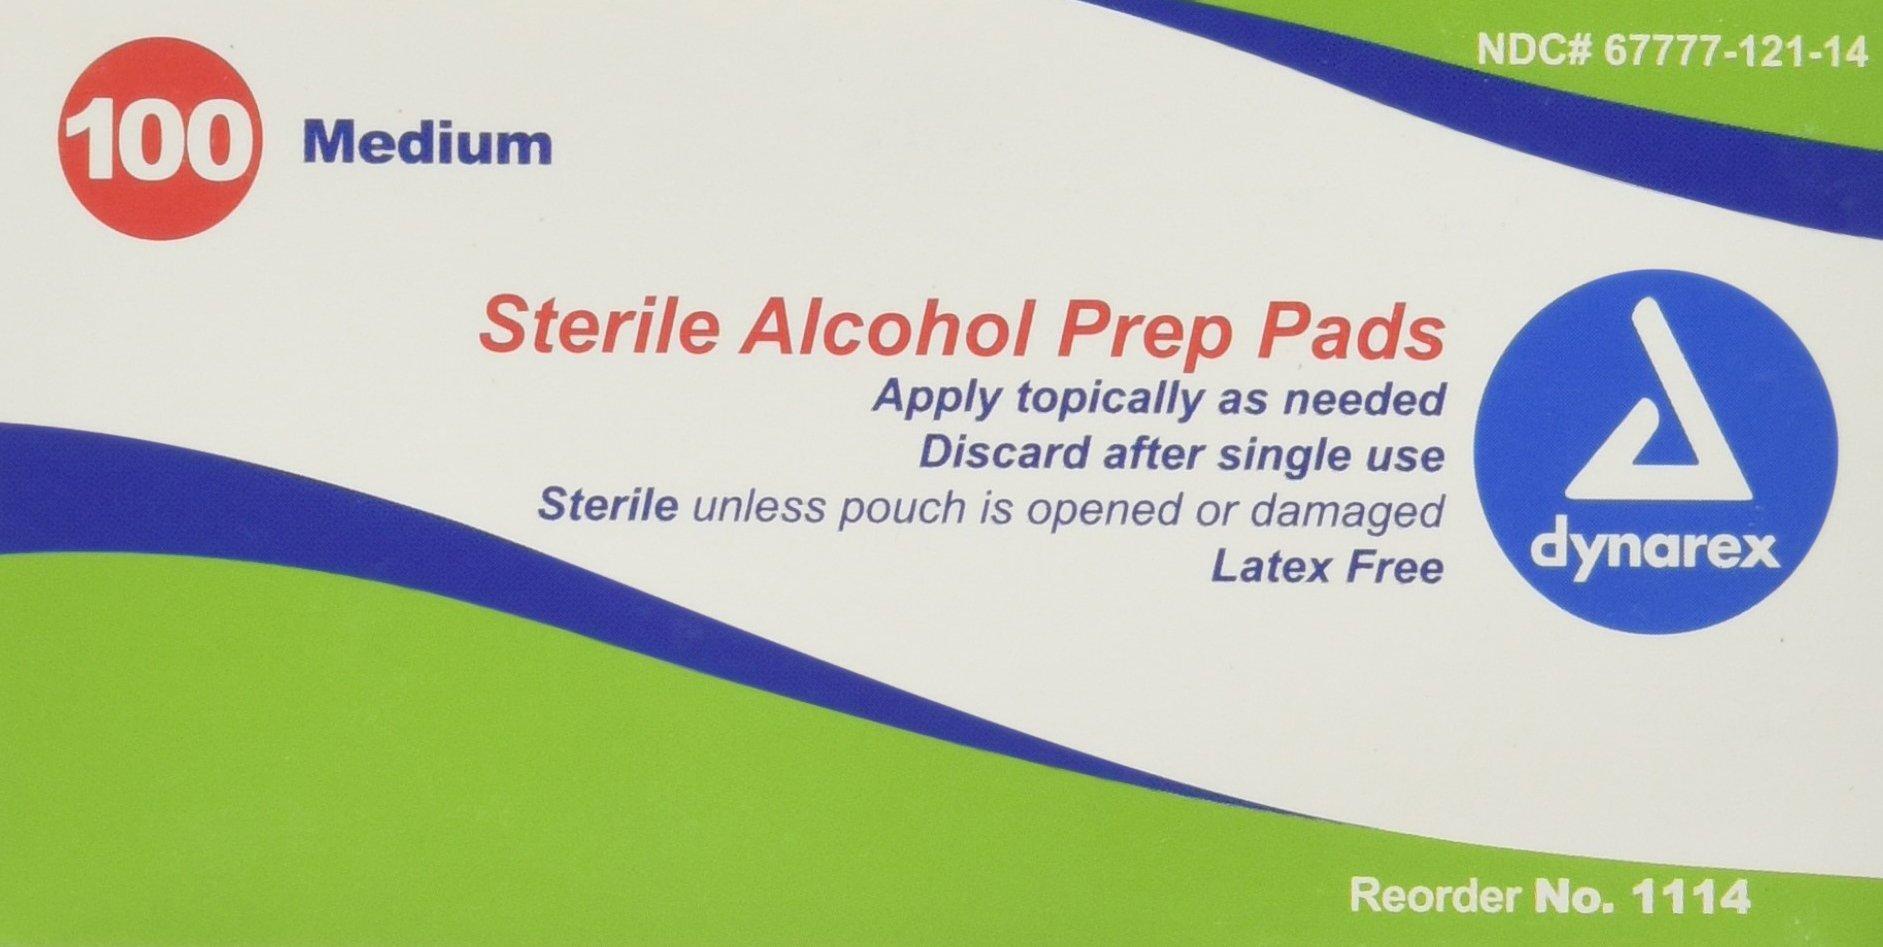 Dynarex Sterile Alcohol Prep Pad, Medium, 100 Count (Pack of 20)